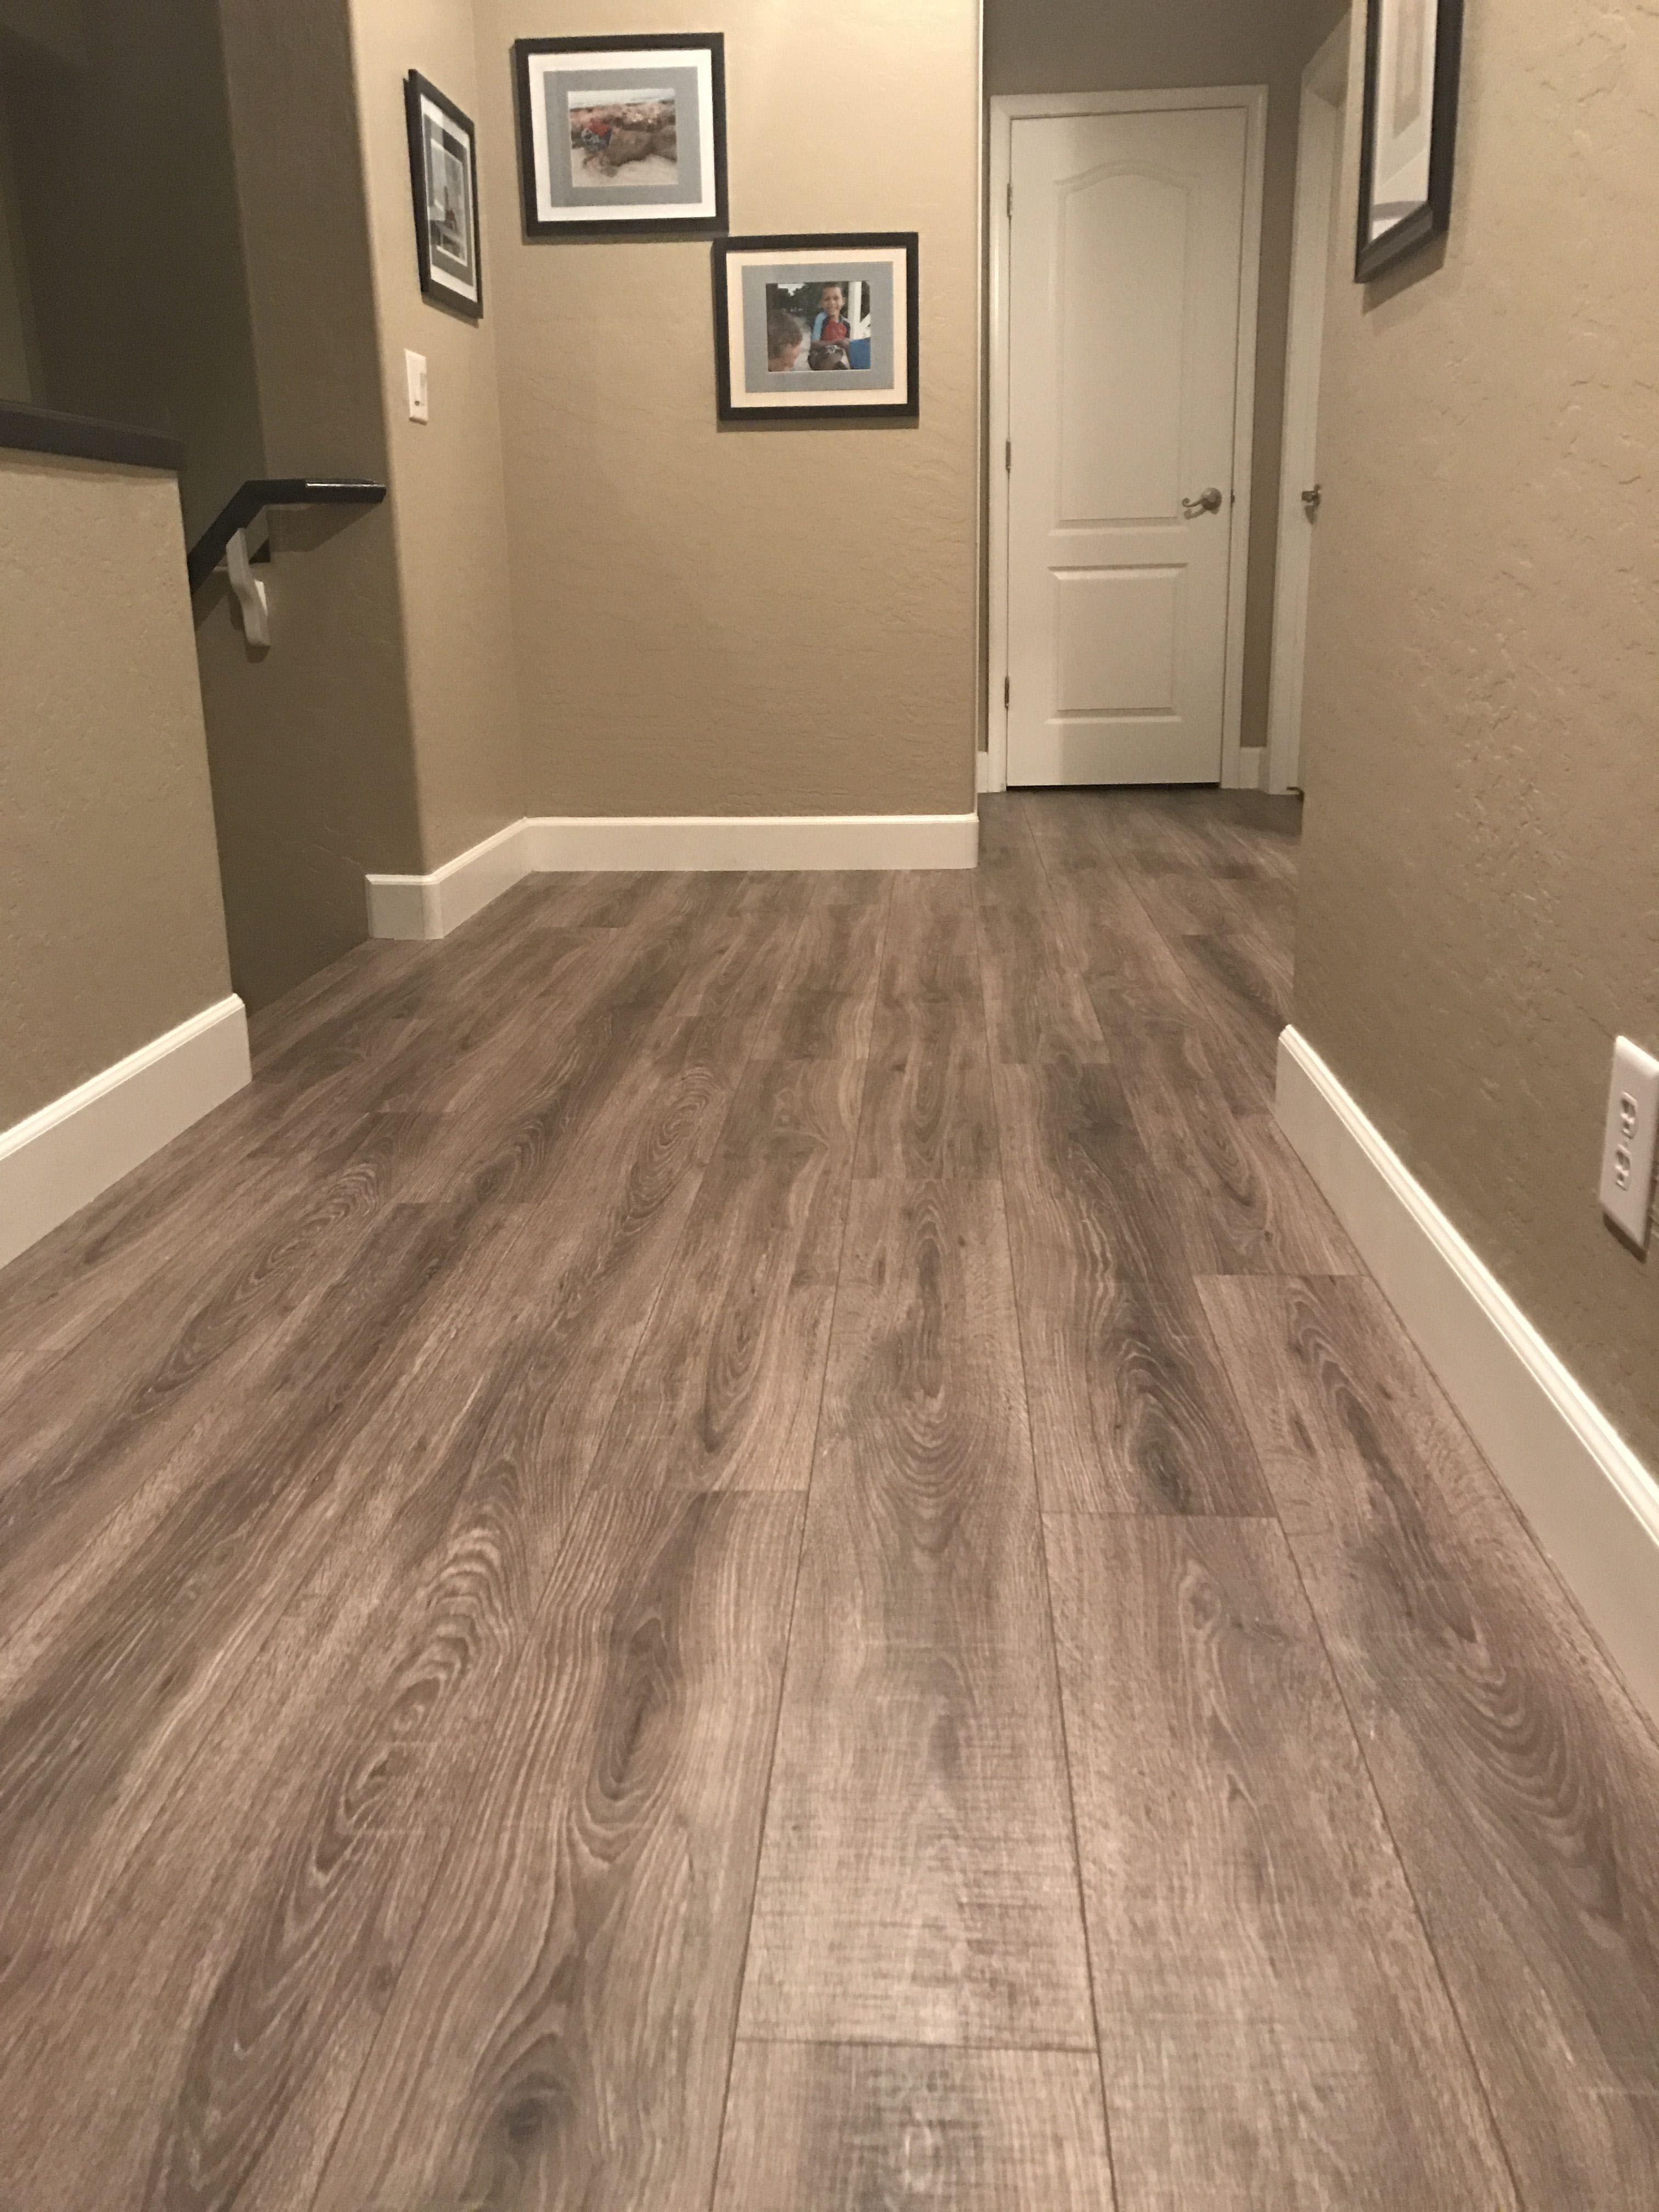 New 8 Mm Thick Vinyl Plank Flooring Exclusive On Interioropedia